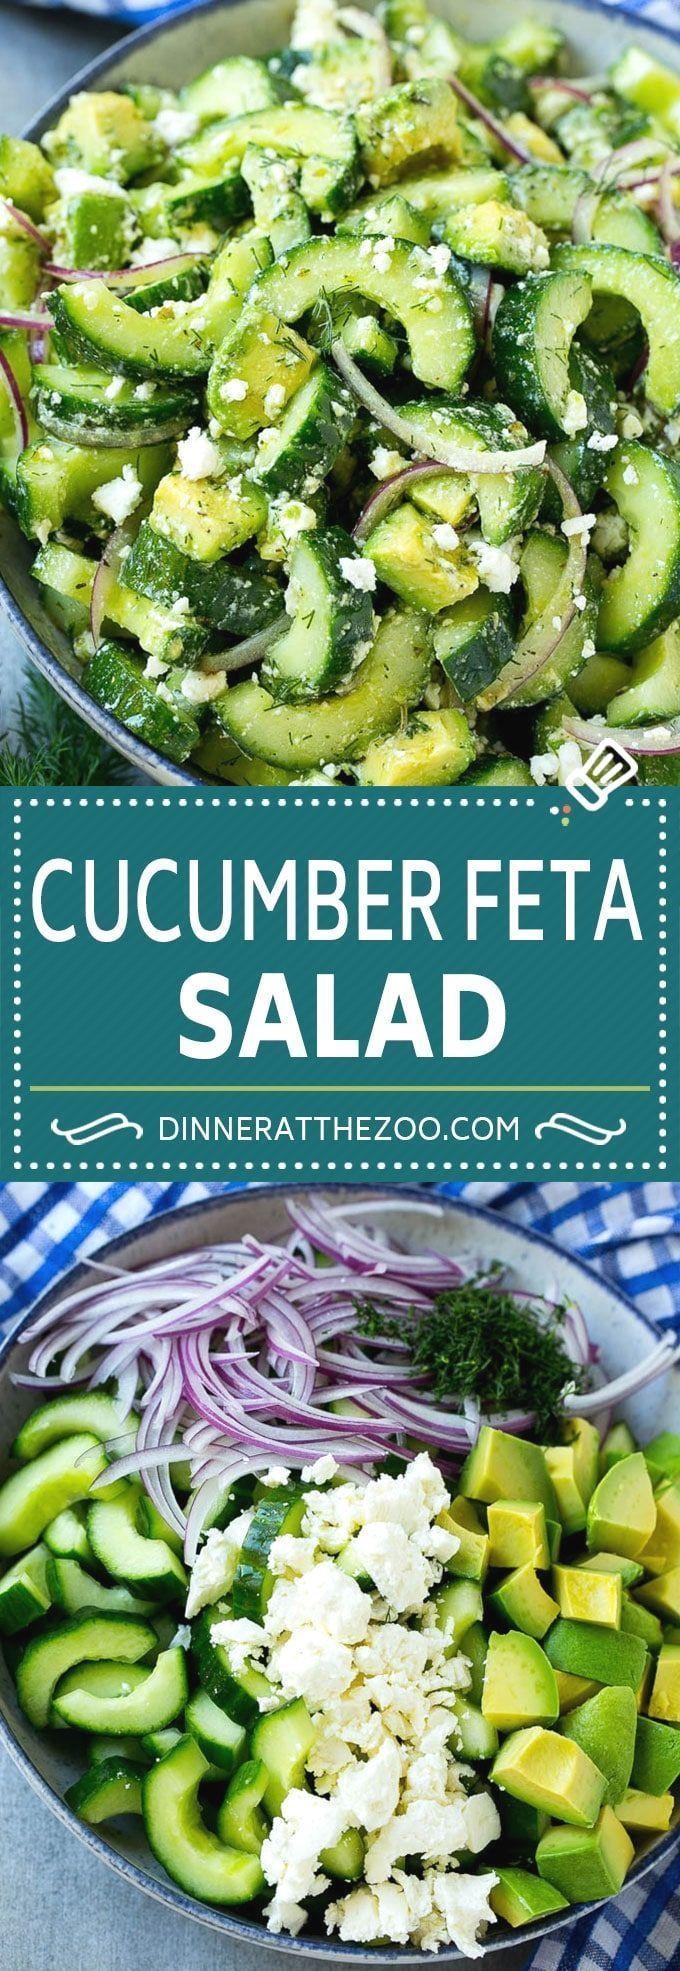 Cucumber Feta Salad Recipe | Cucumber Salad | Feta Cheese Salad | Summer Salad #...,  #Cheese... #ketofriendlysalads